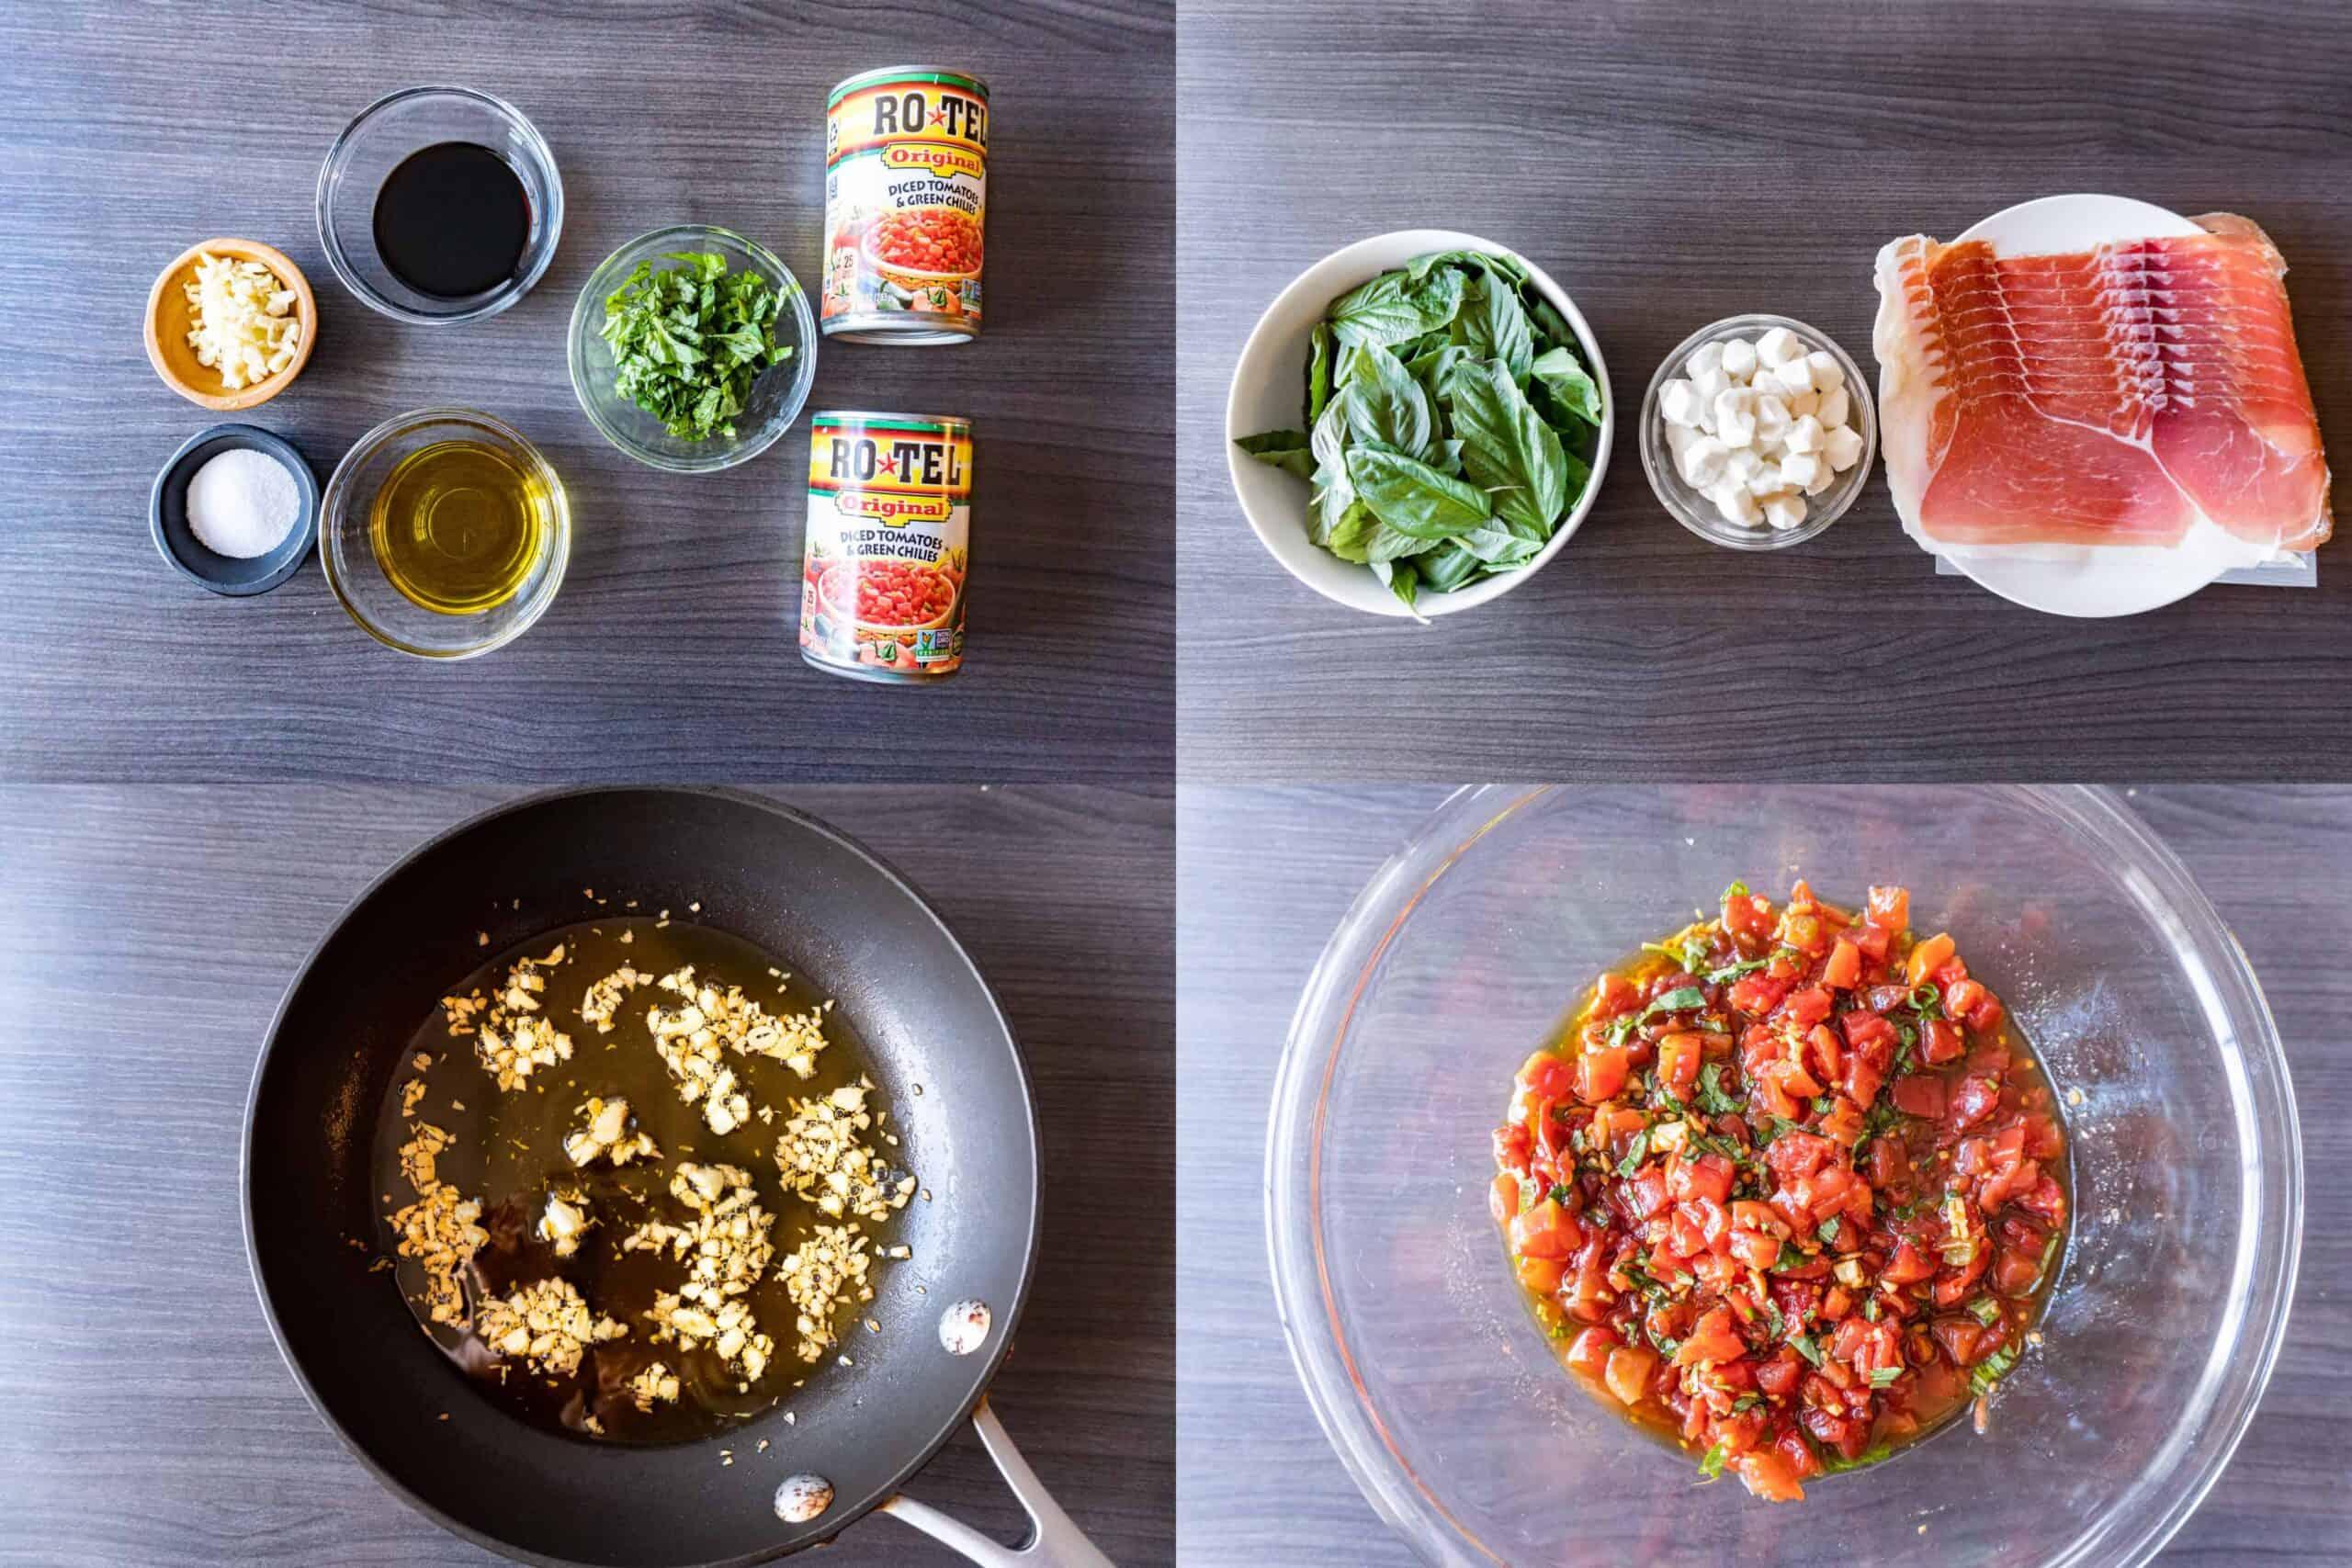 bruschetta ingredients and making it process shots